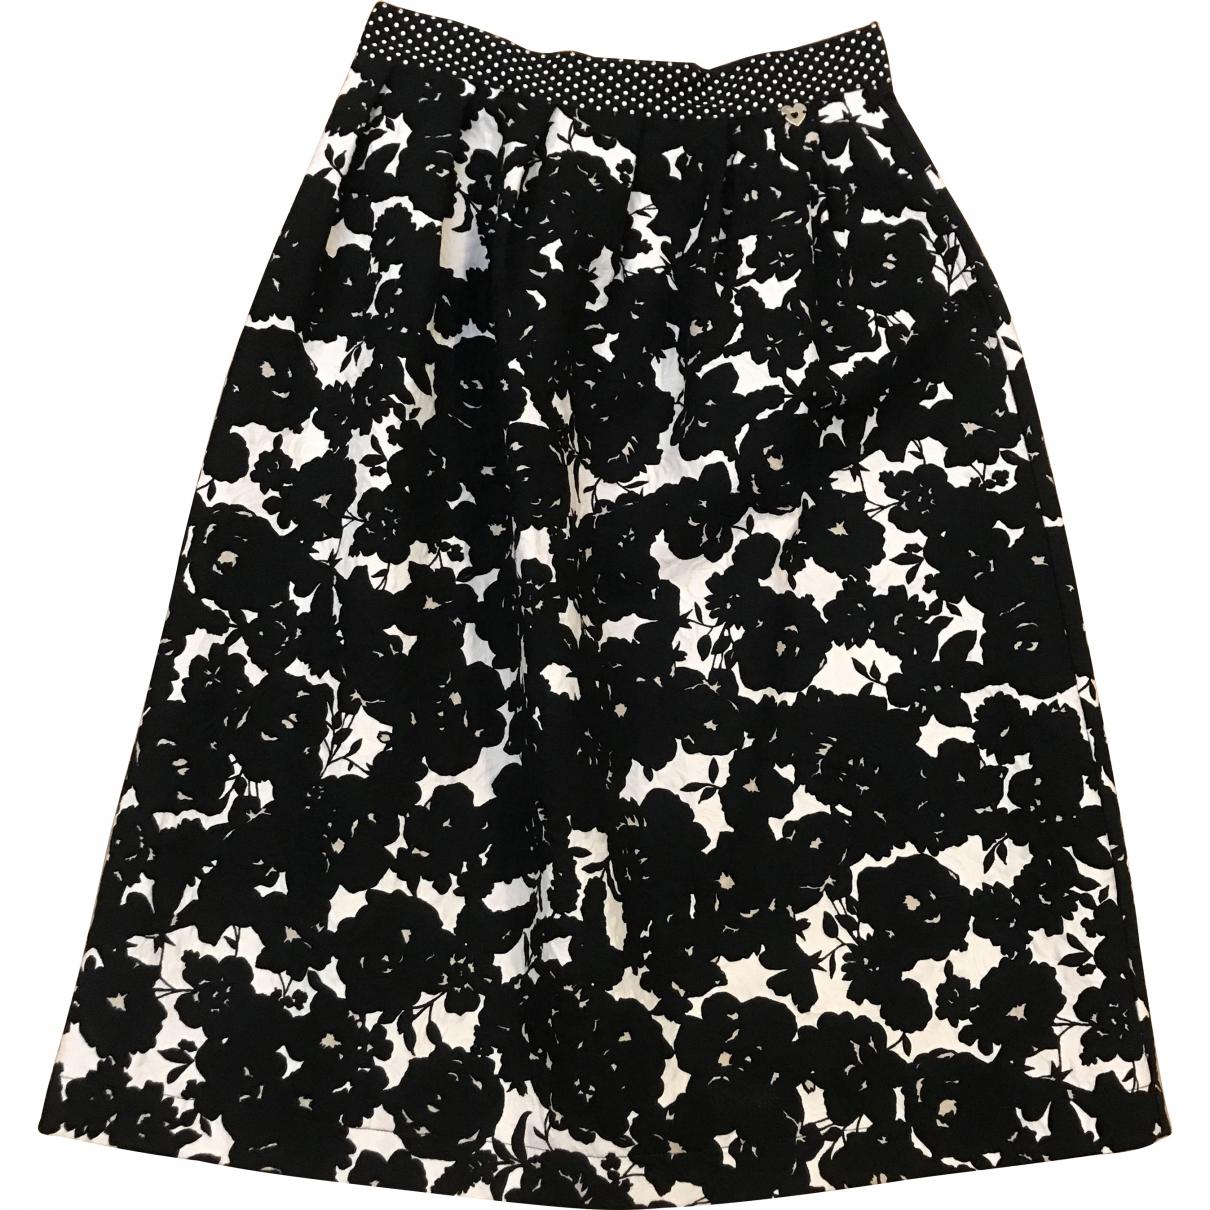 Twin Set \N Black Cotton skirt for Women S International